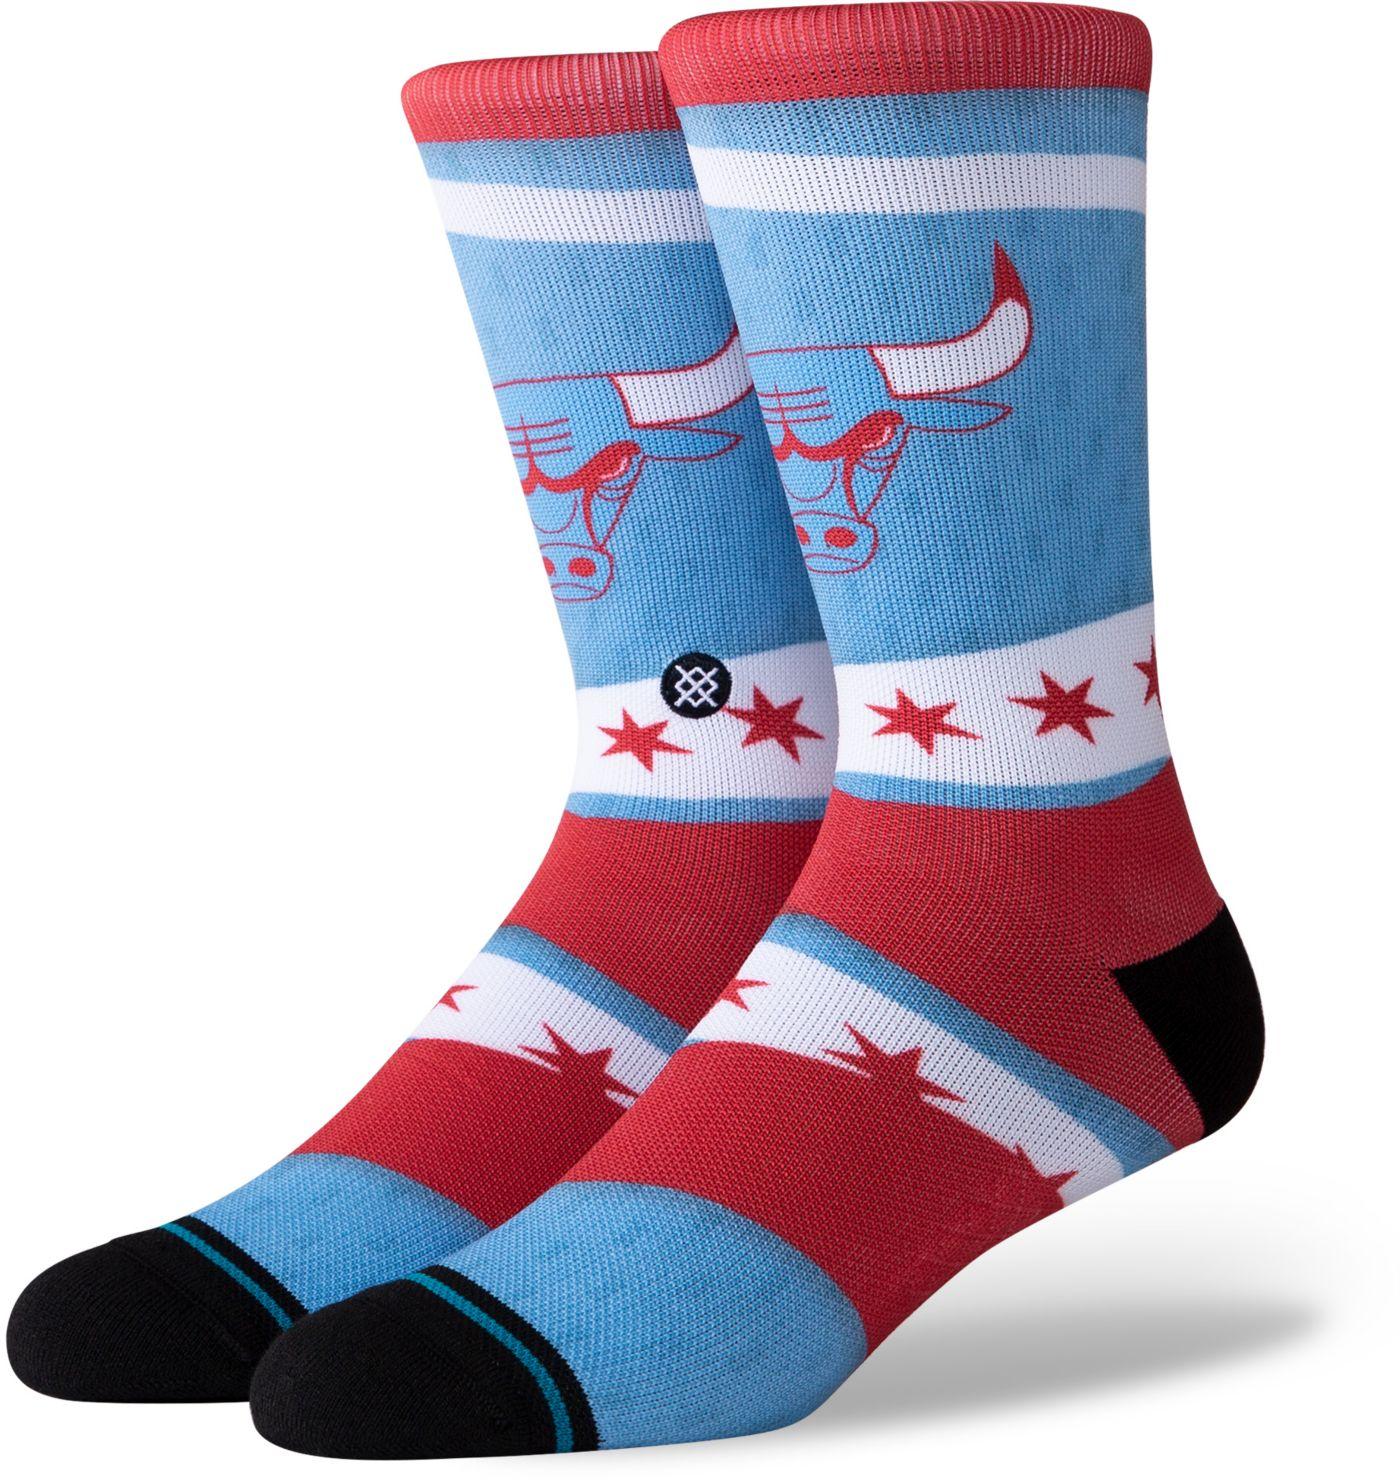 Stance Chicago Bulls City Edition Jersey Crew Socks